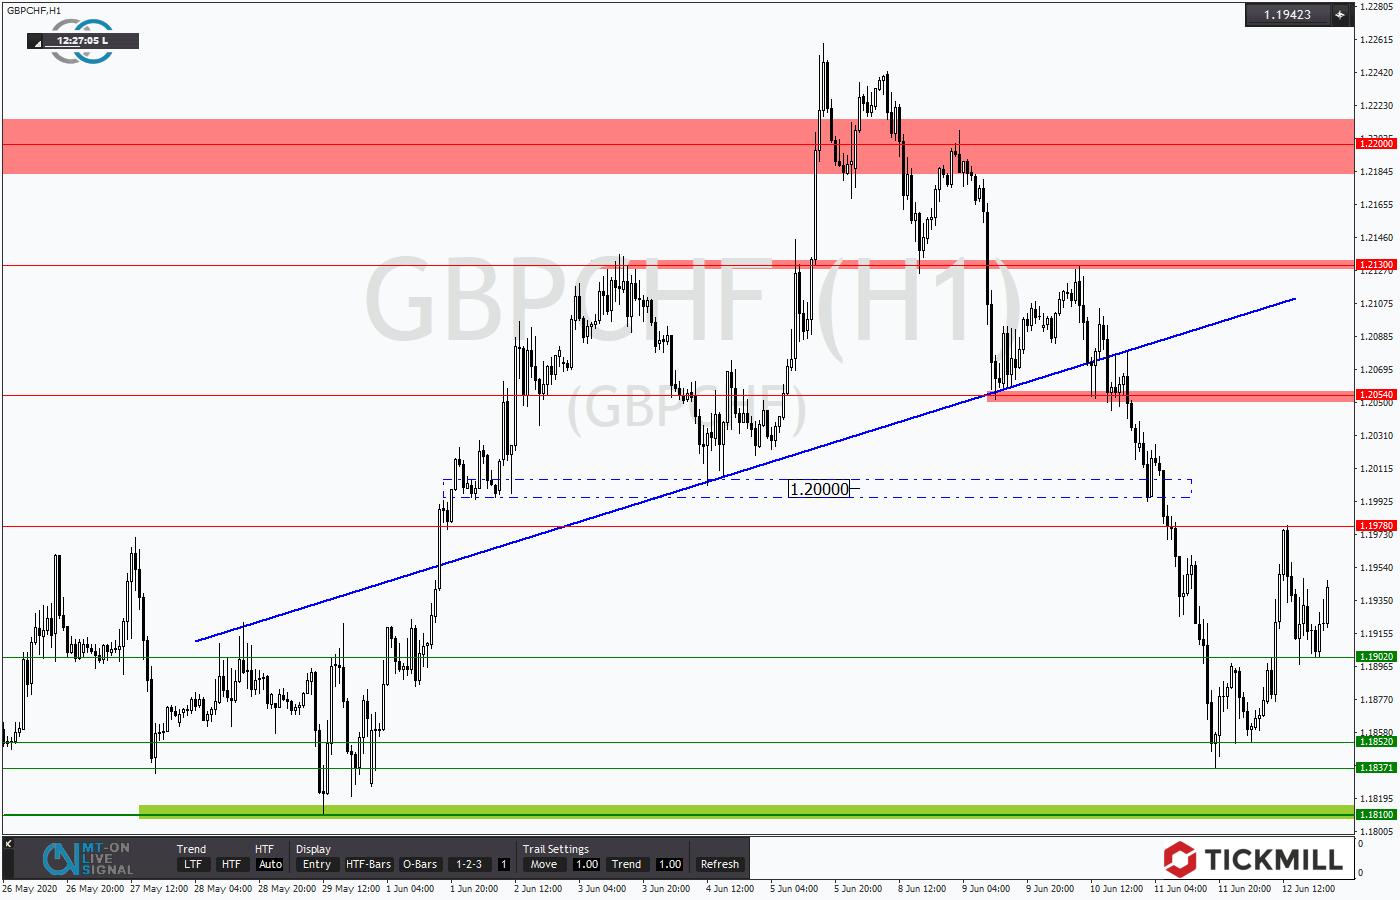 Tickmill-Analyse: GBPCHF mit kurzfristiger Kursumkehr